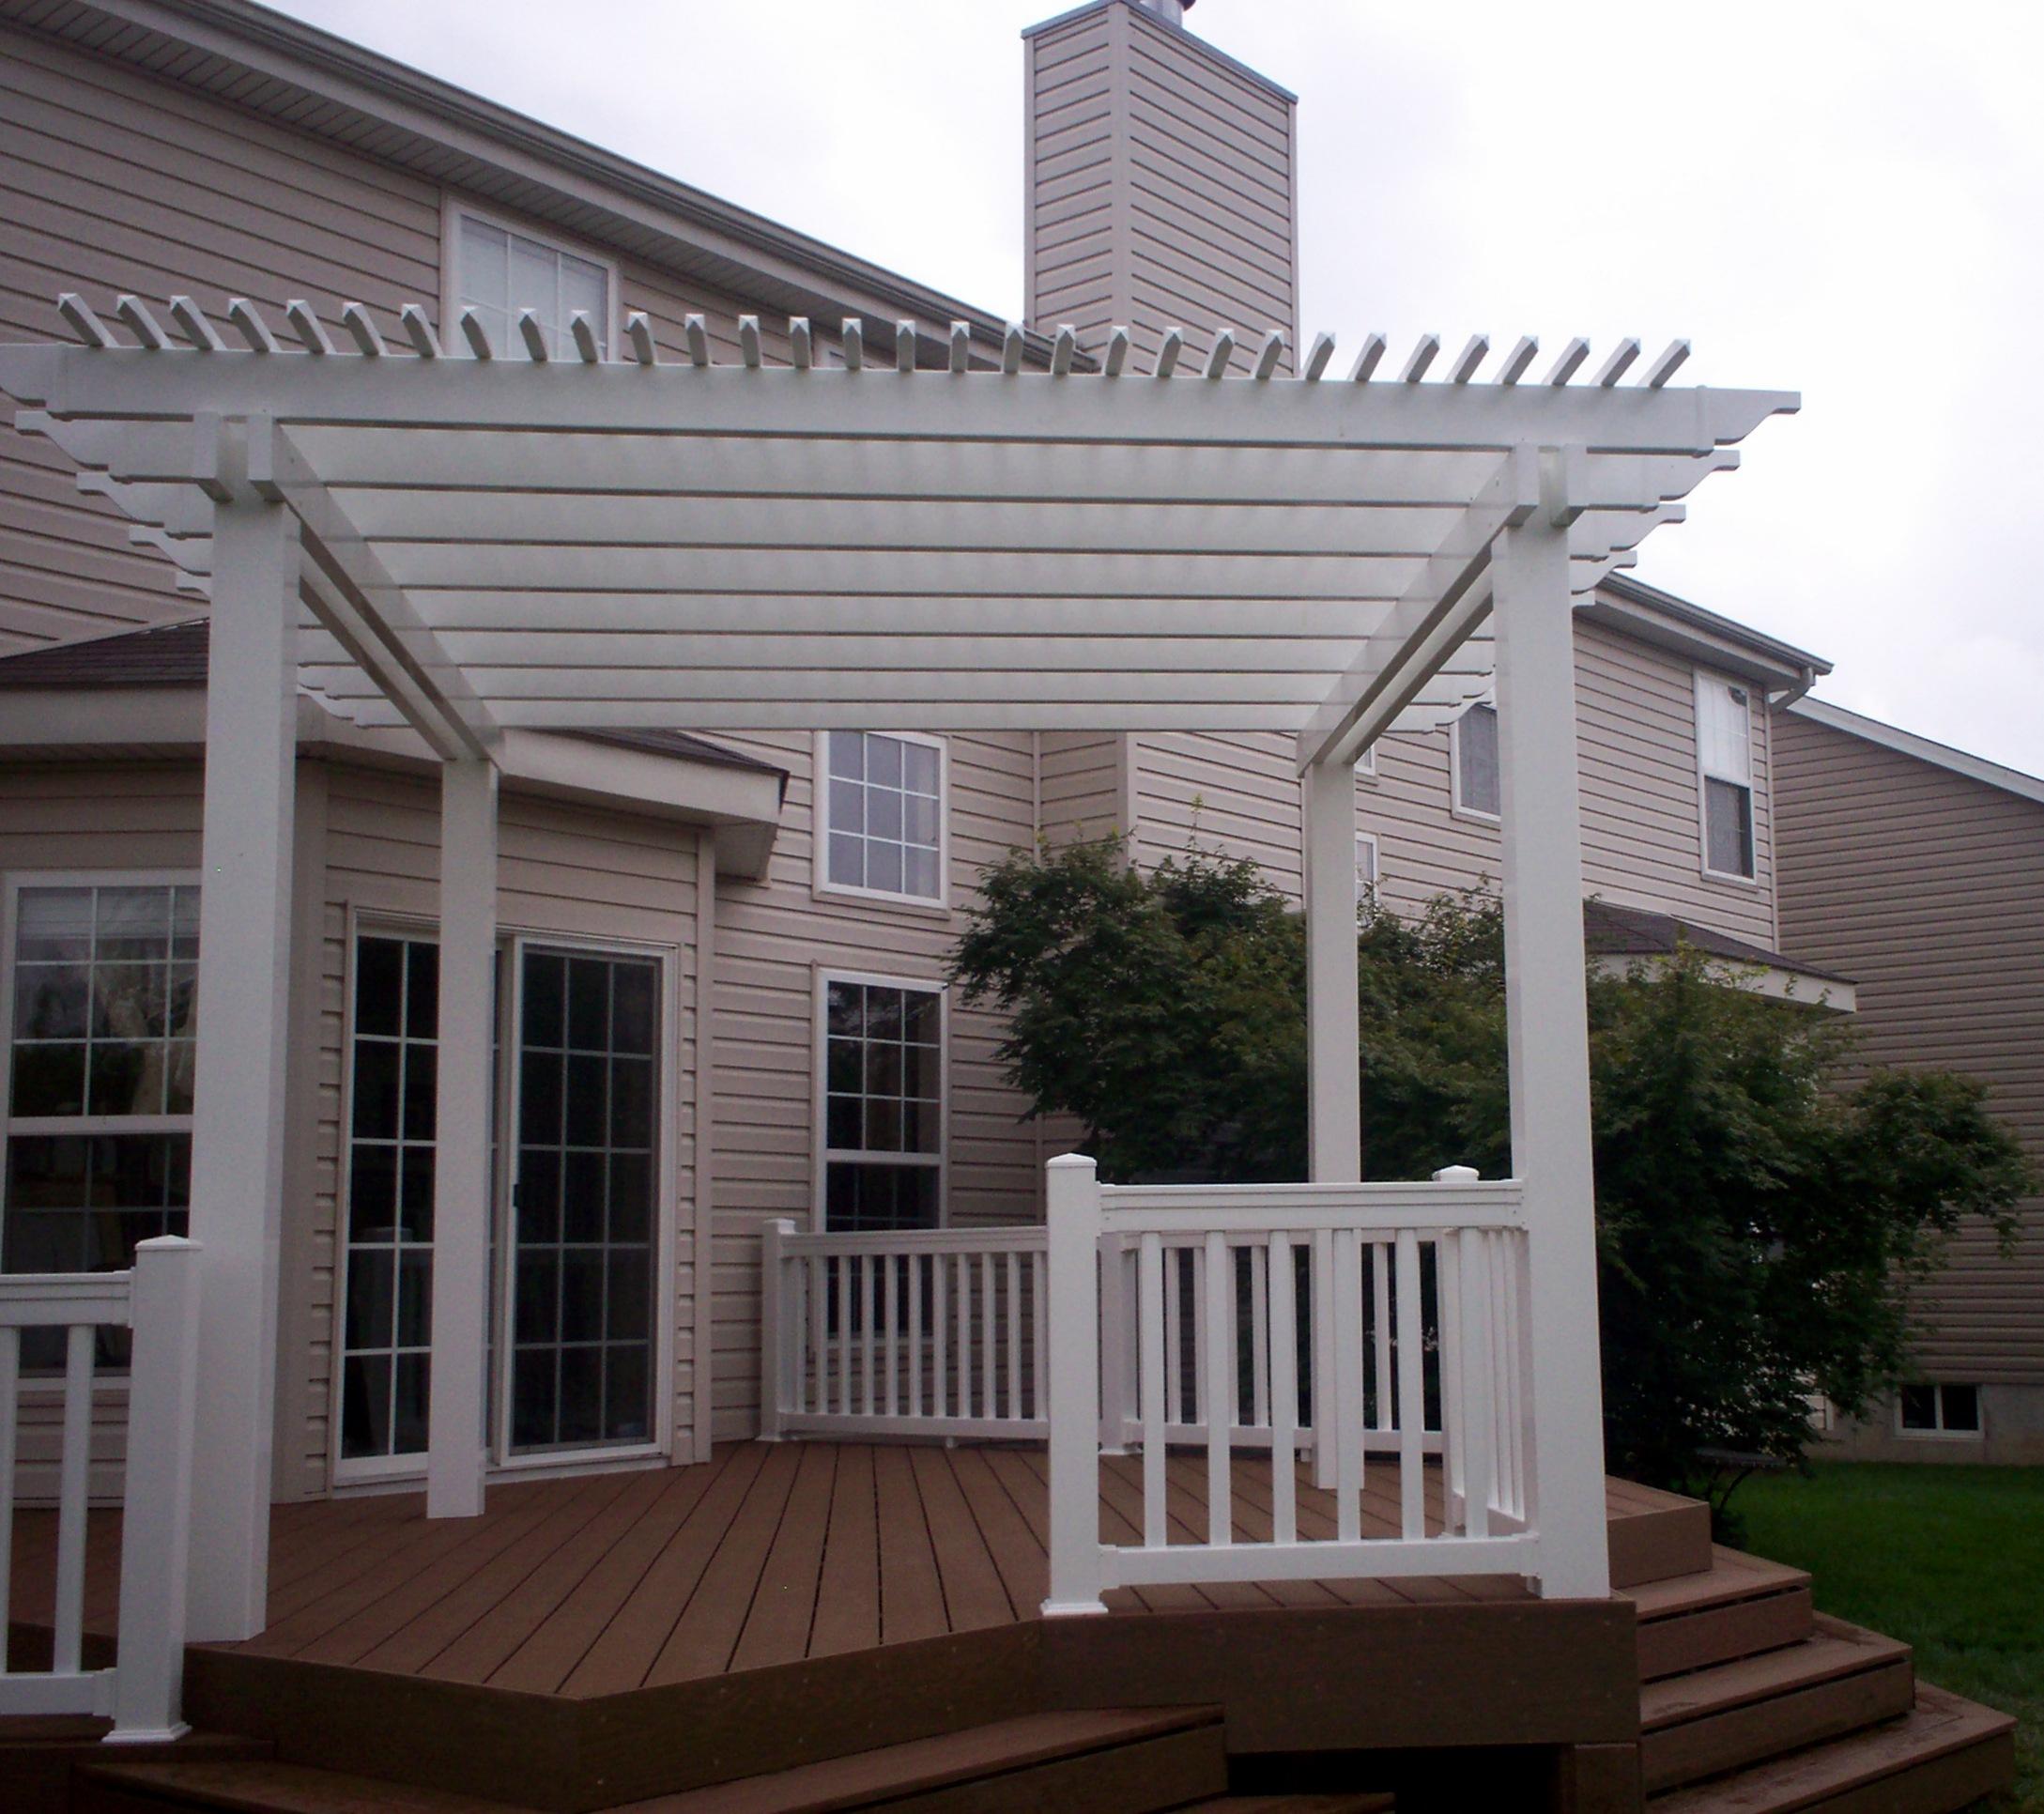 Pergola Ideas On Deck: St. Louis Decks, Screened Porches